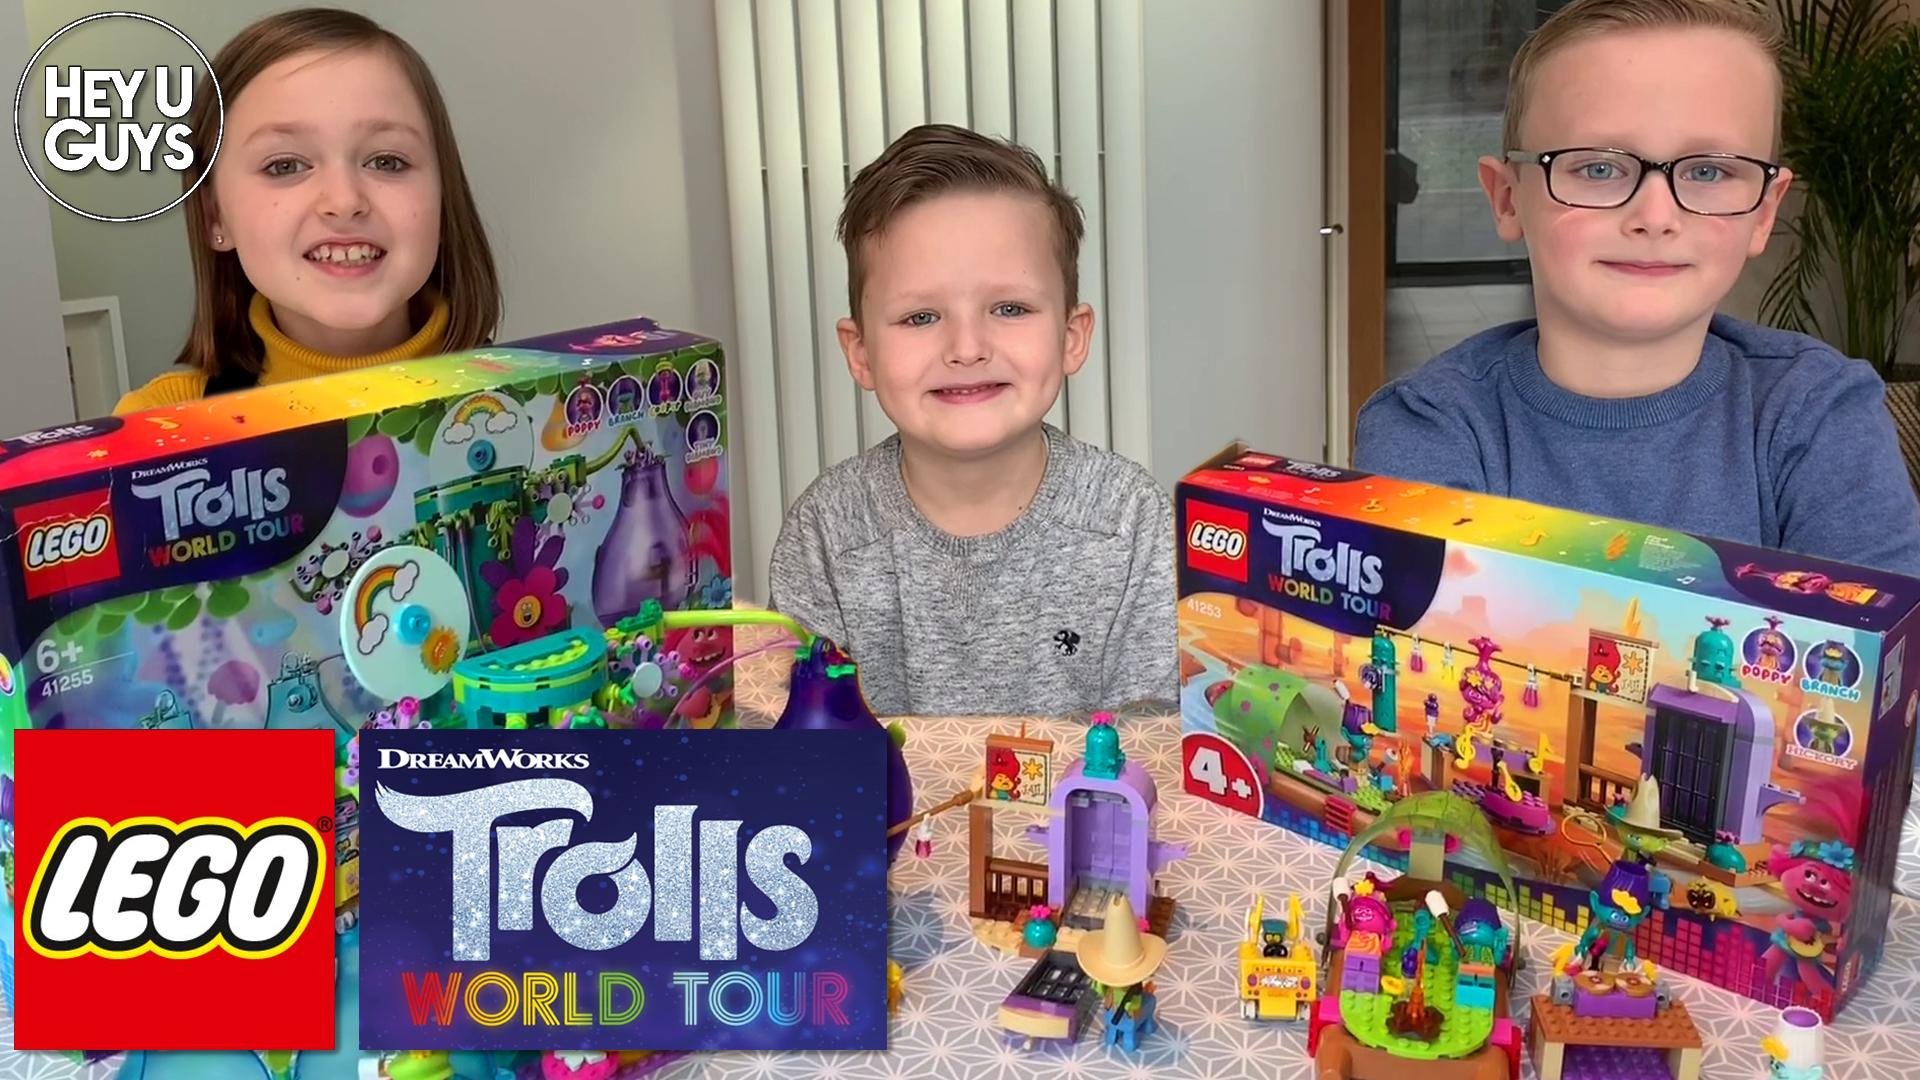 trolls-world-tour-lego